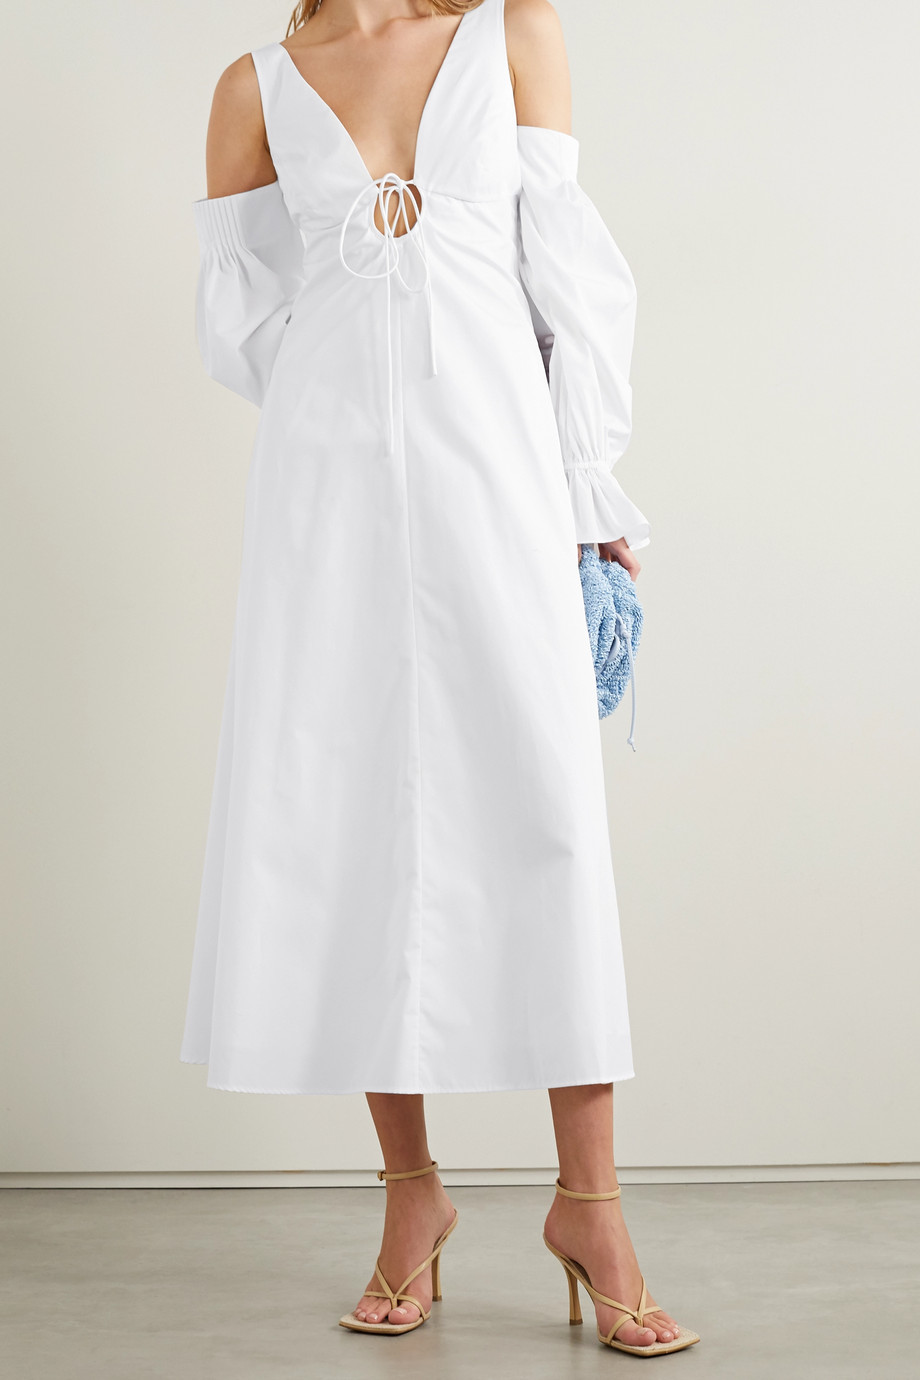 Rosie Assoulin Convertible cold-shoulder cotton-poplin midi dress